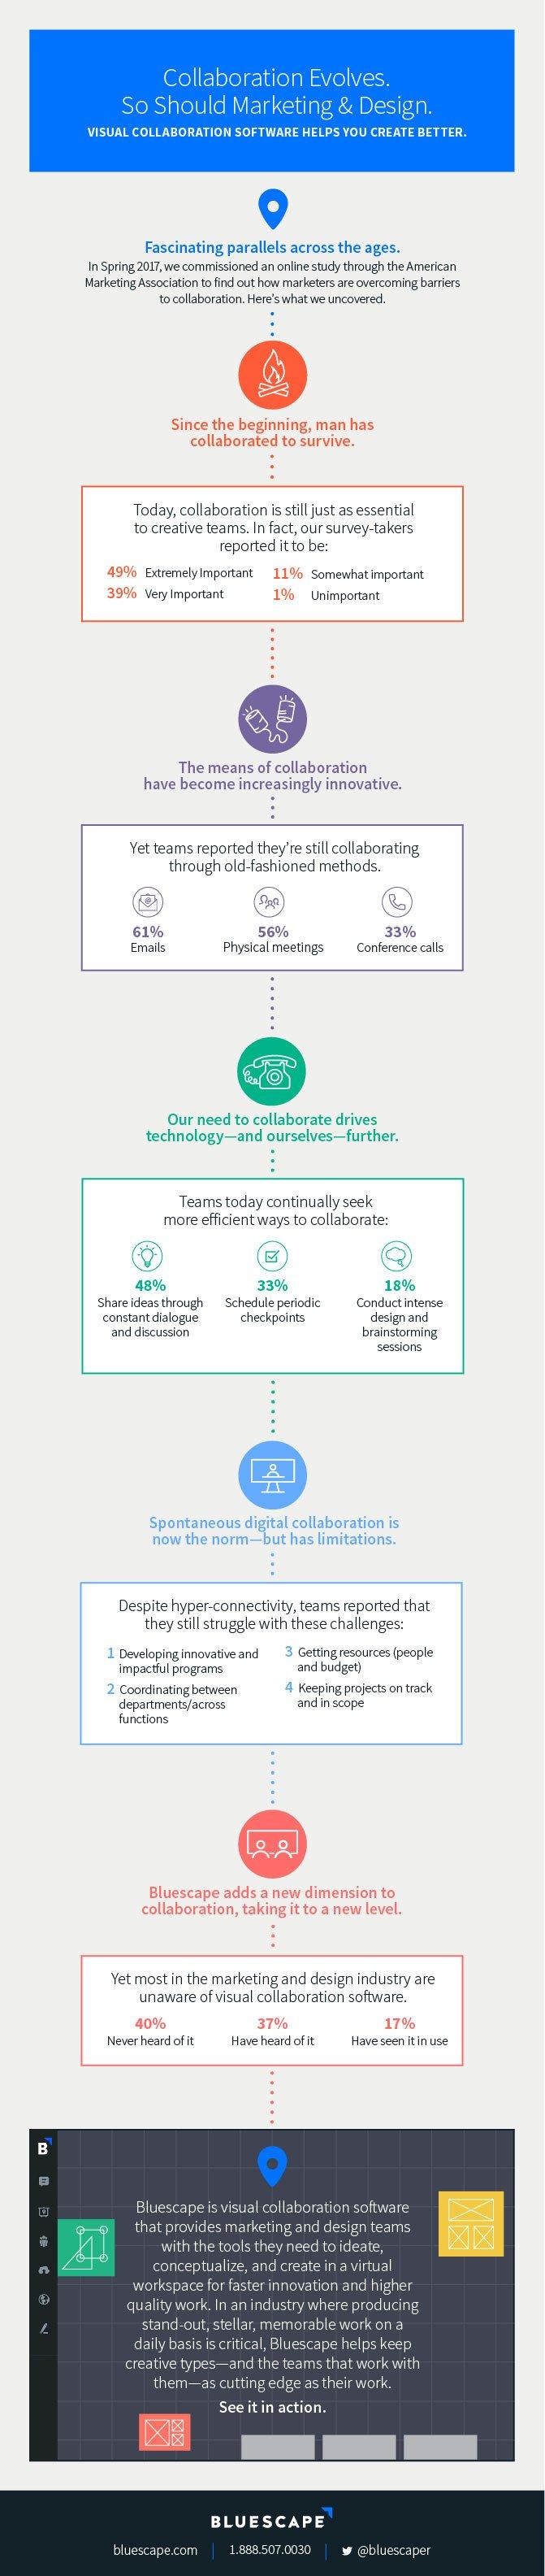 Marketing Infographic.jpg